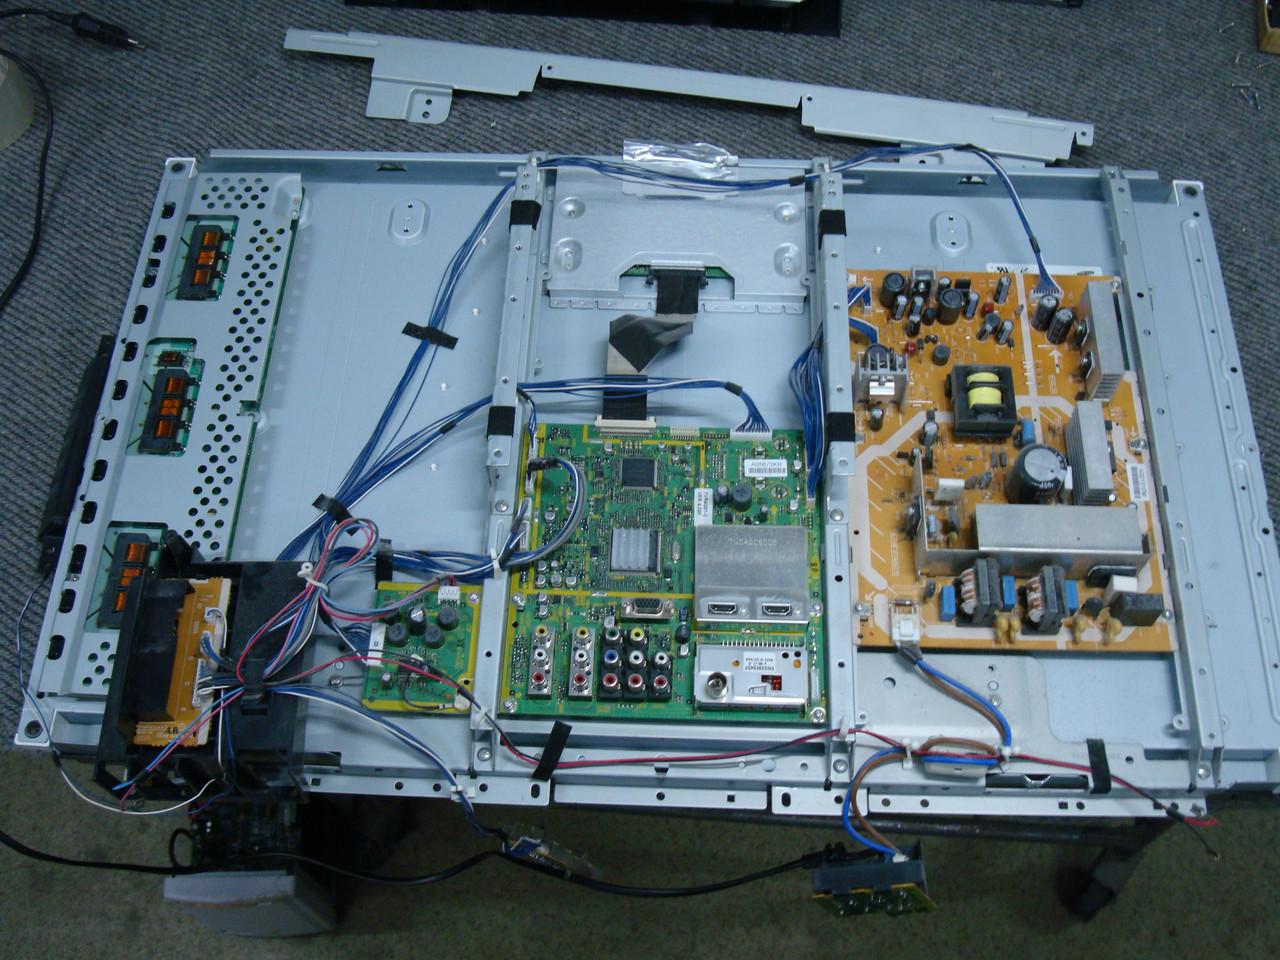 Запчастини до телевізора Panasonic TX-R32LE8 (TNP4G431, TNP4G433, 320AA03C2LV0.0, INV32S12M REV 0.5)